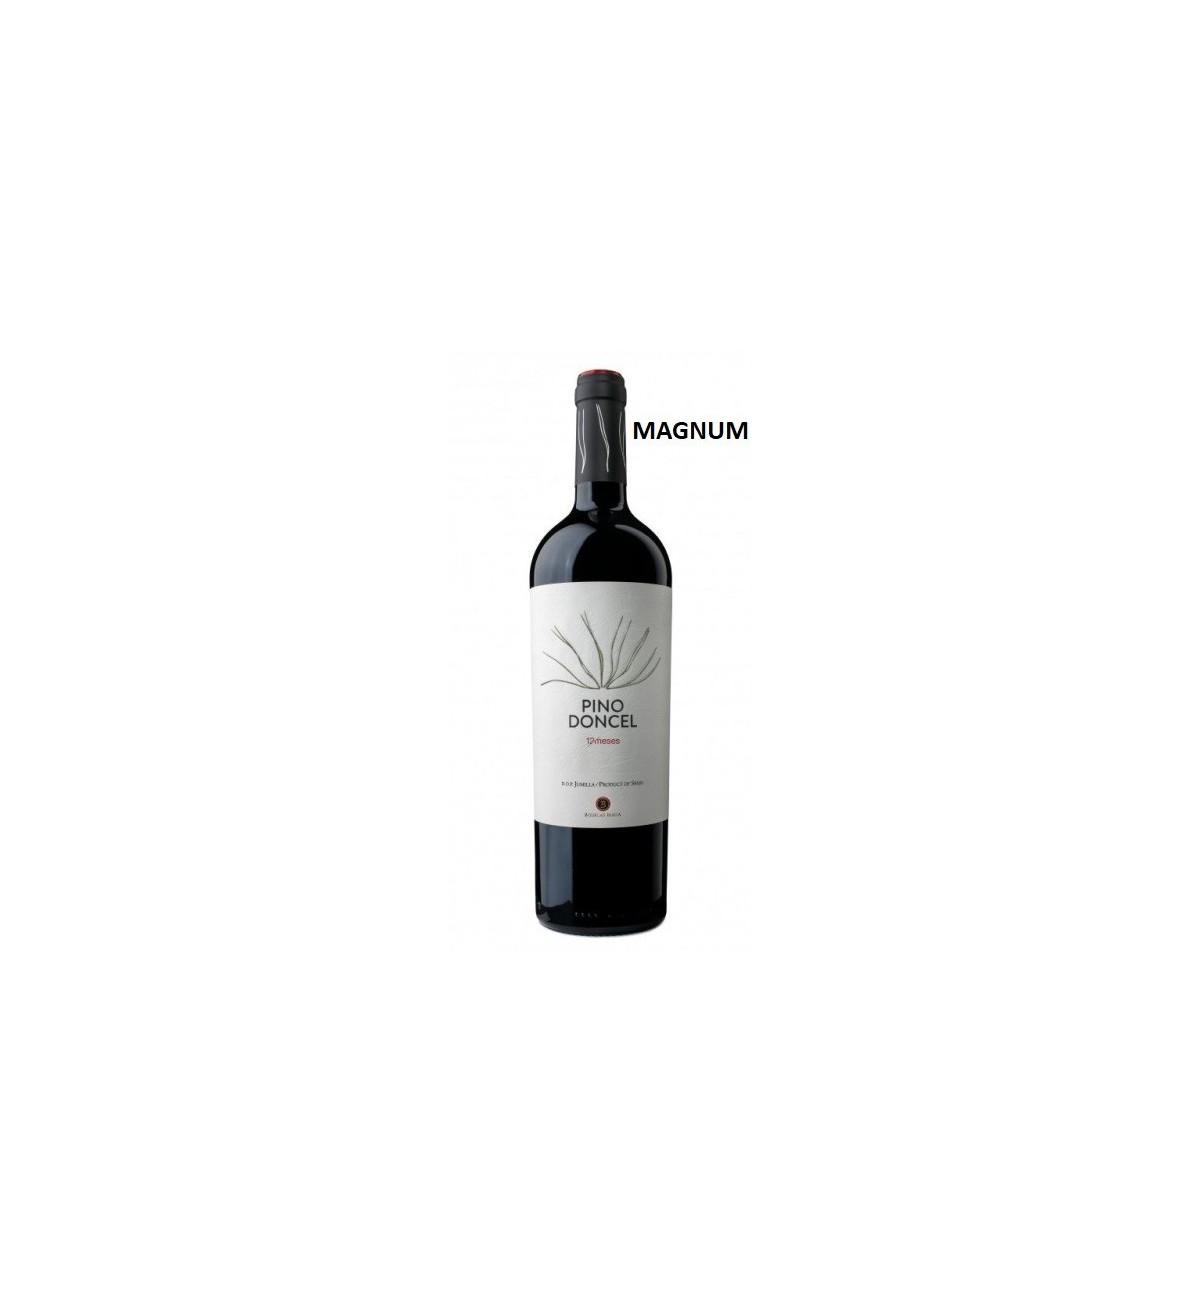 Pino Doncel 12 meses 2016 MAGNUM - Vino Tinto, Jumilla, Monastrell, Syrah